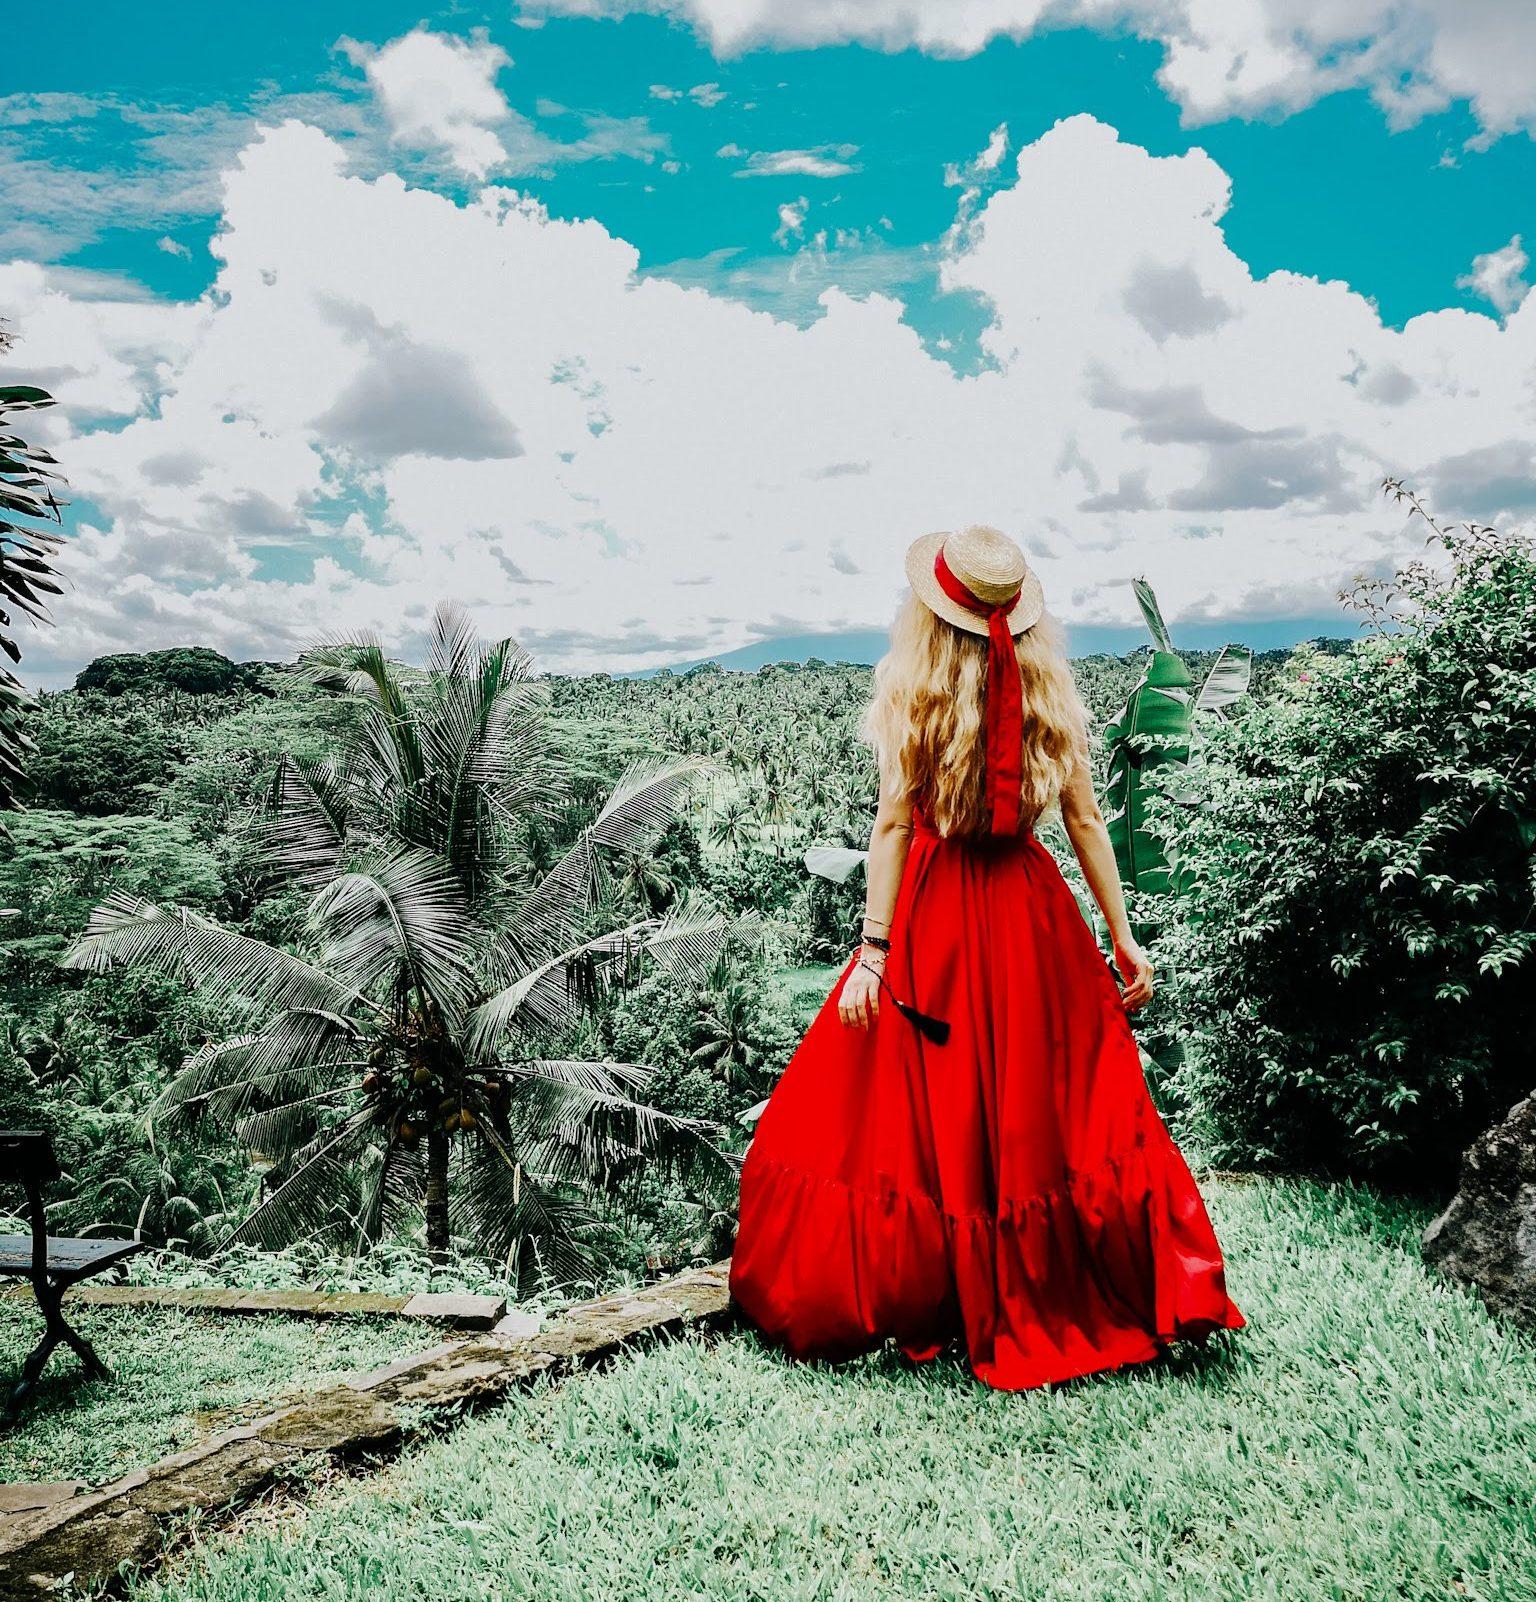 ruxandra babici red dress. social media marketing. digital marketing. instagram expert